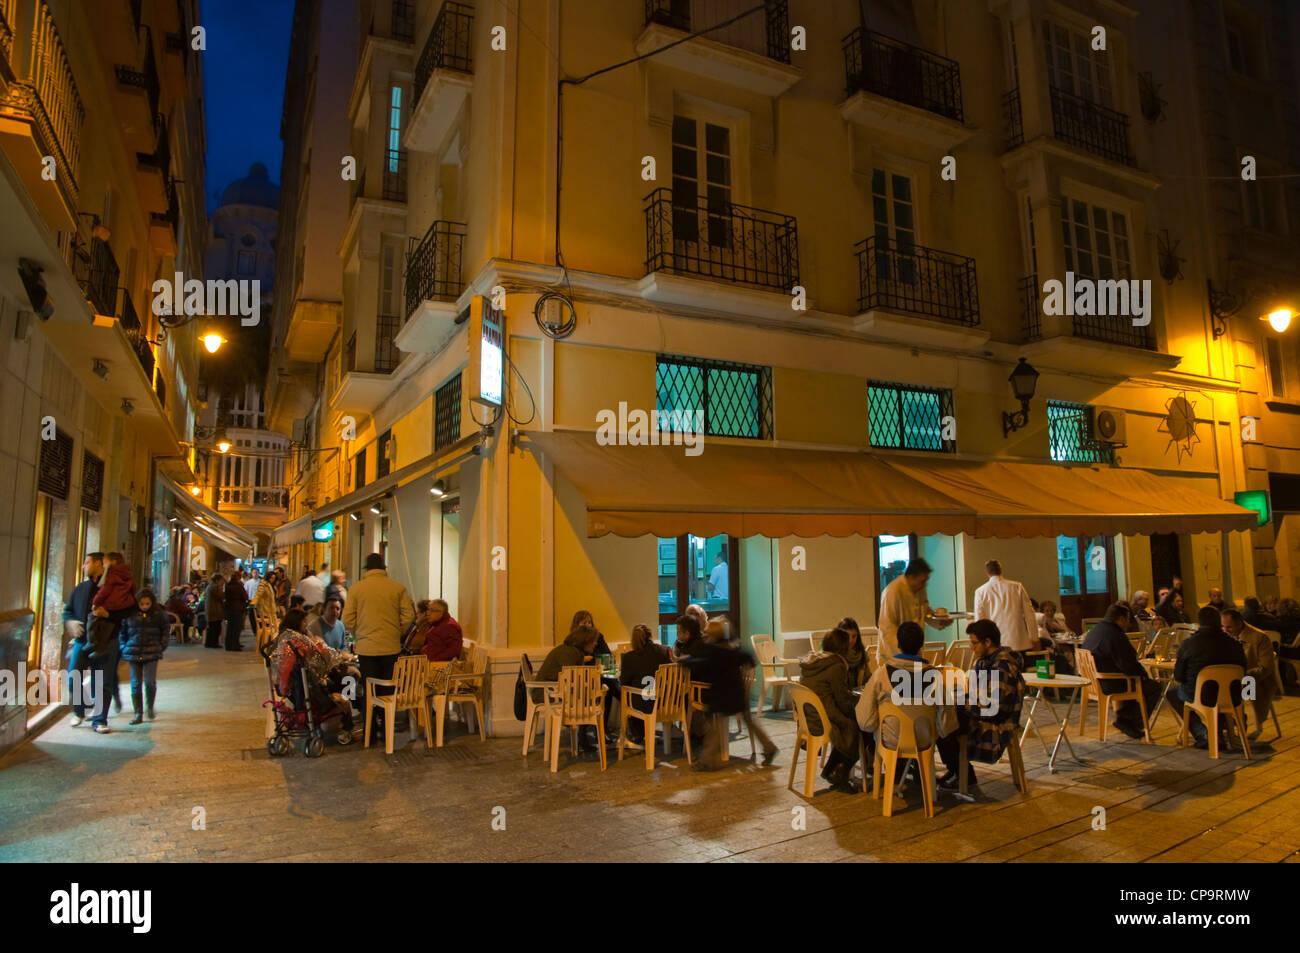 Casa Aranda cafe exterior central Malaga Andalusia Spain Europe Stock Photo